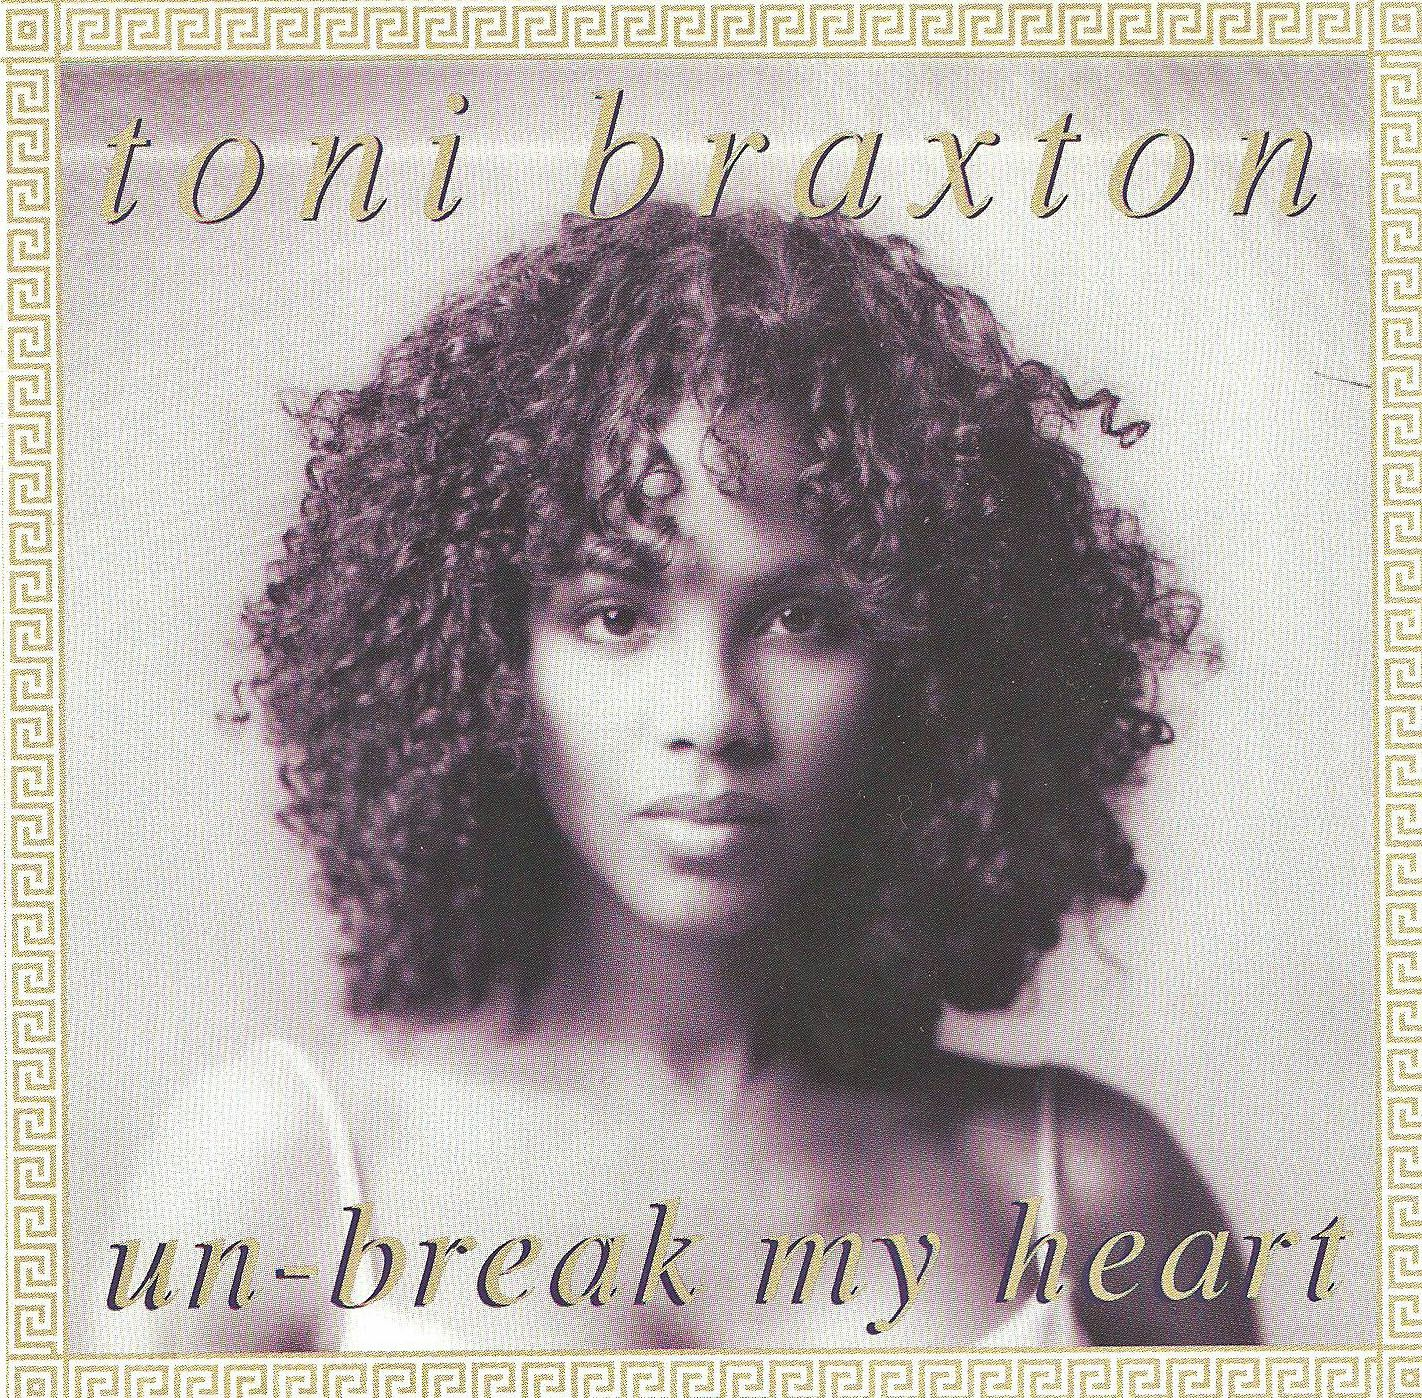 Toni Braxton's